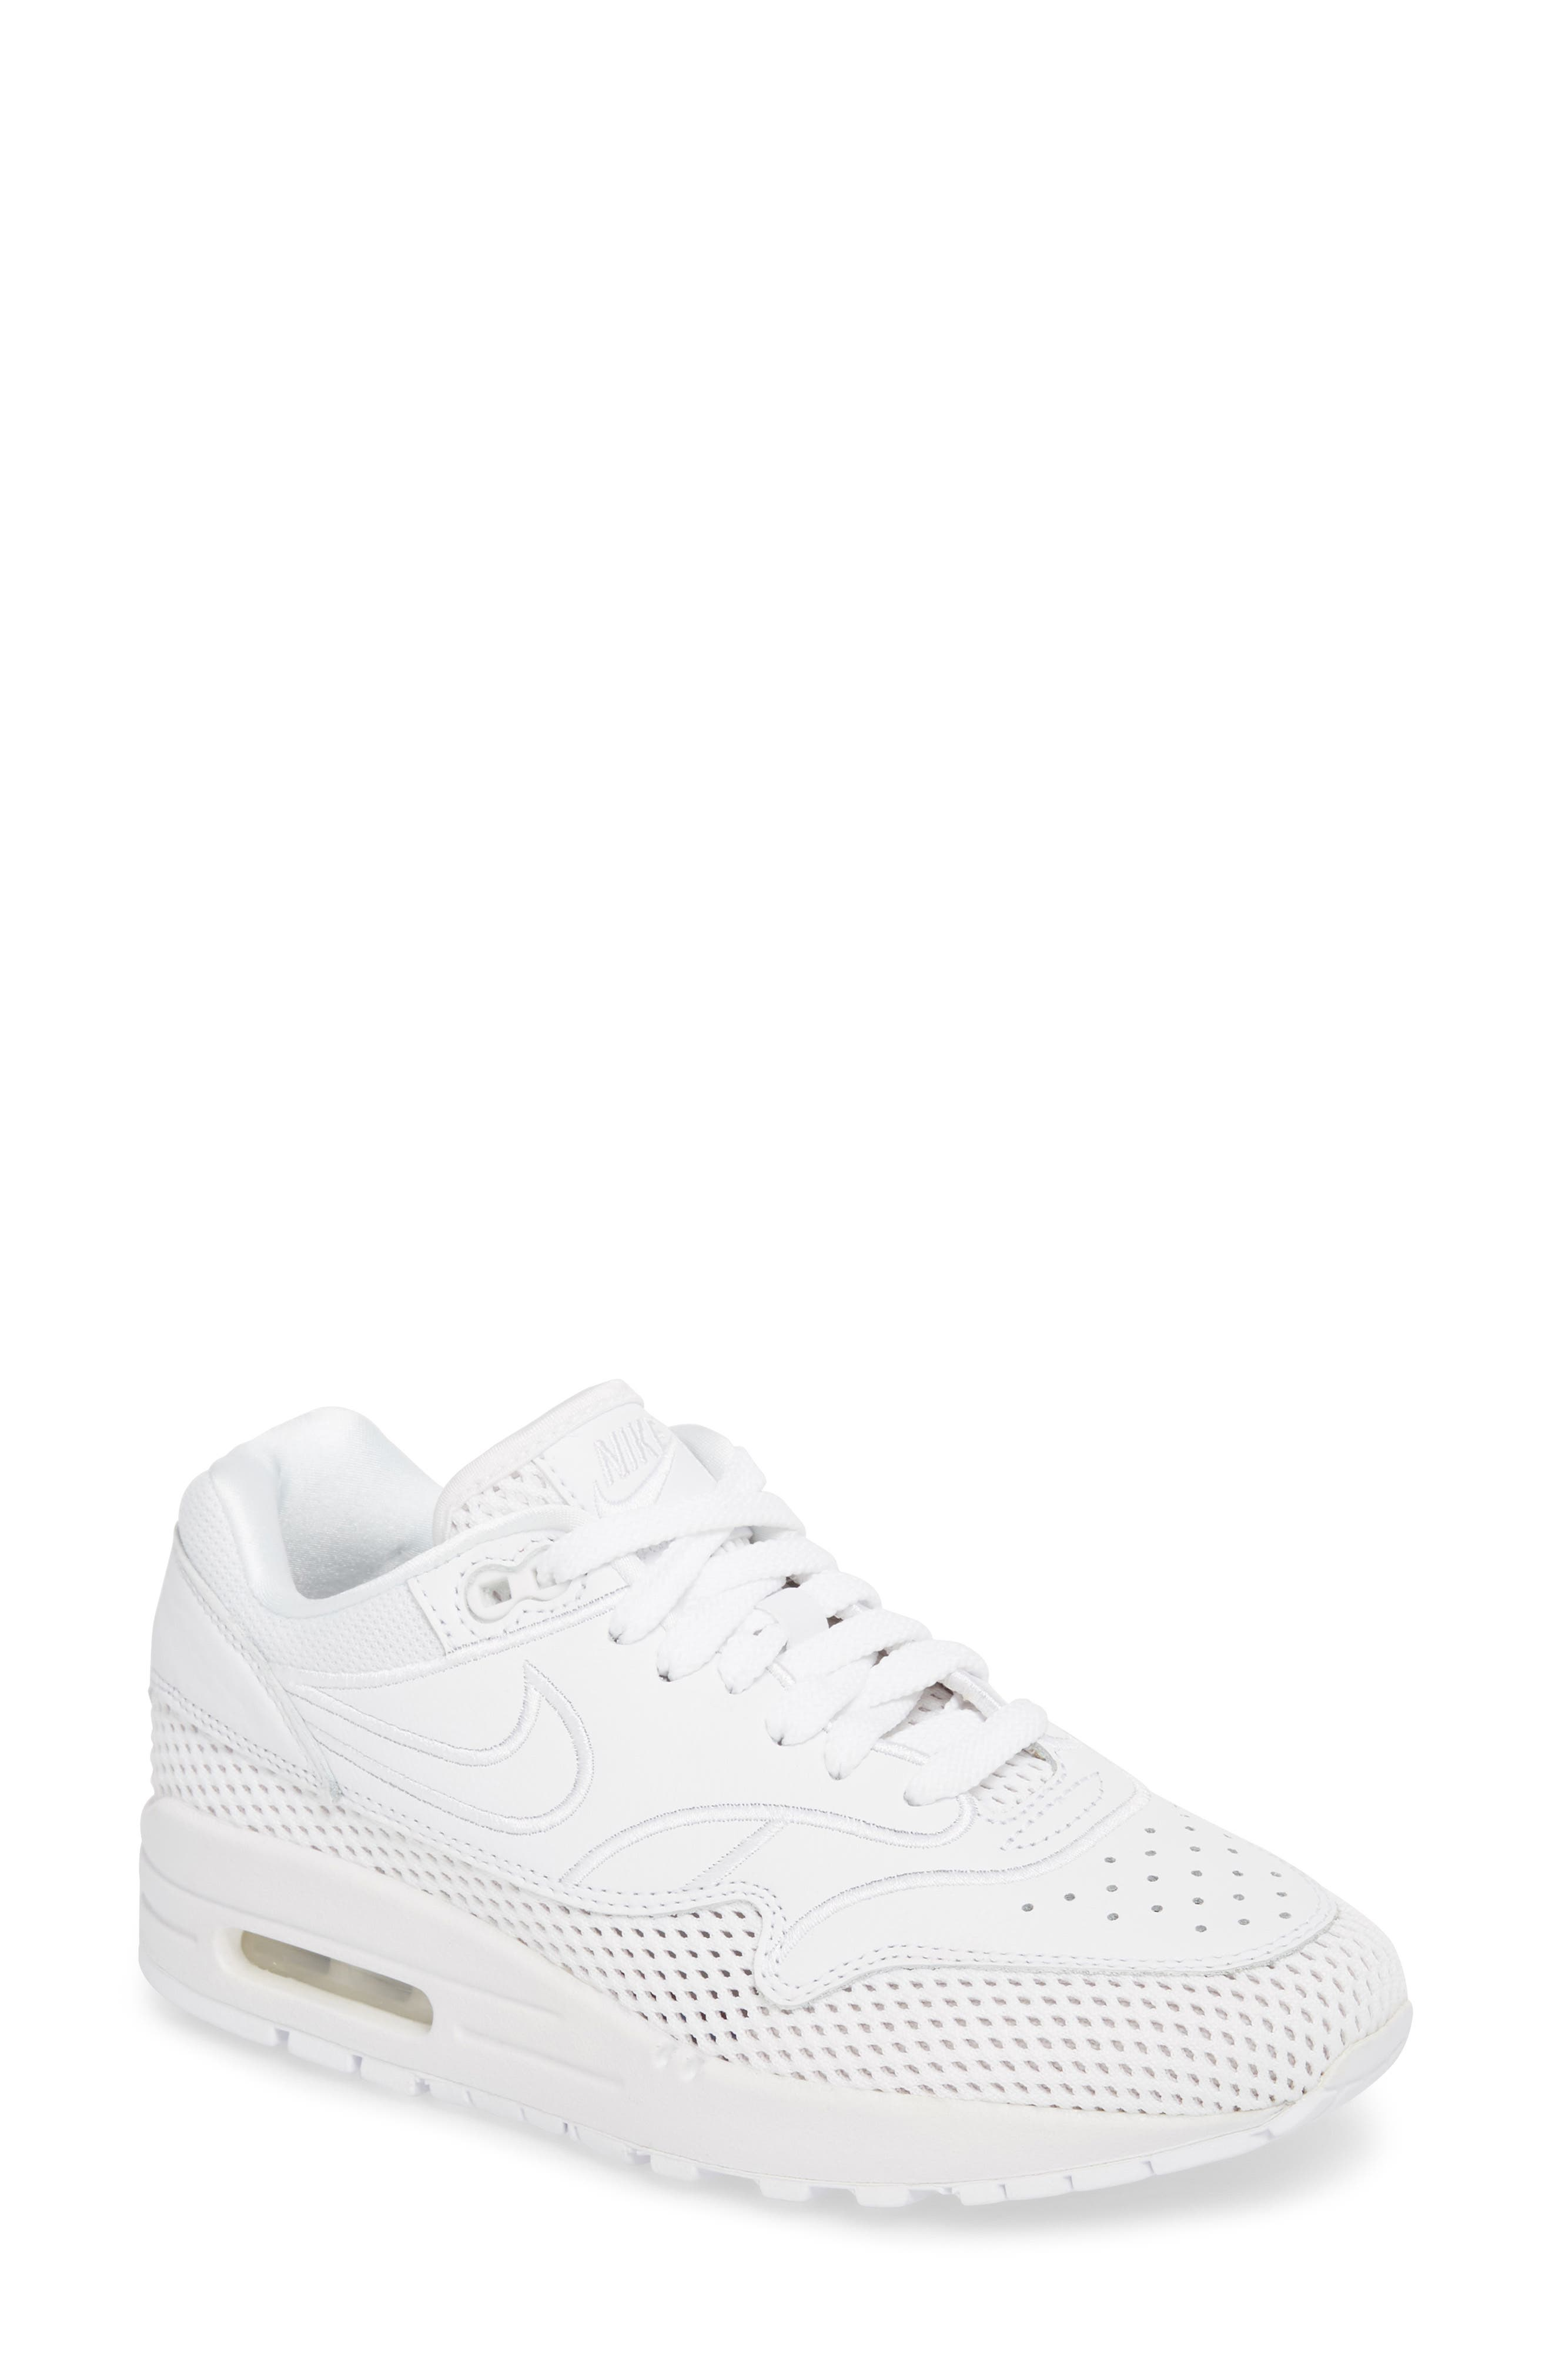 Air Max 1 SI Sneaker,                             Main thumbnail 1, color,                             100